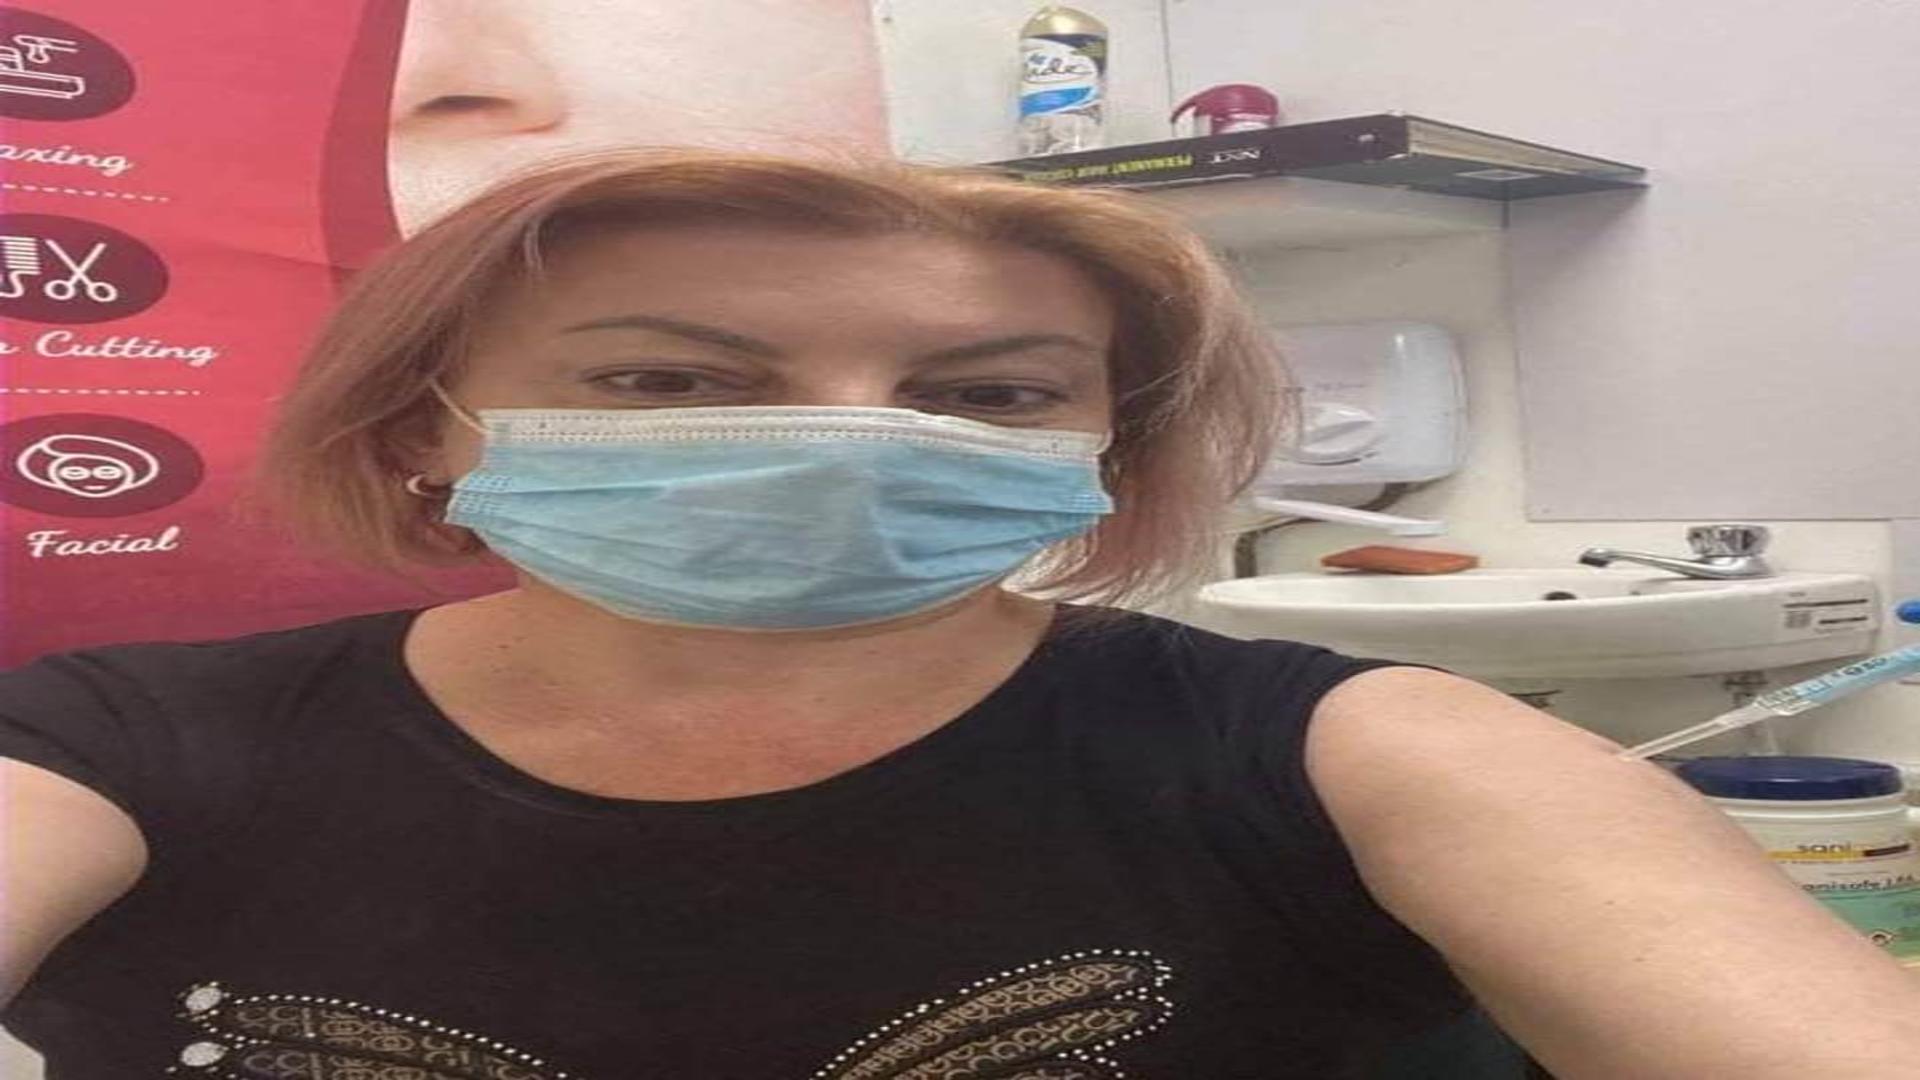 Un politician moldovean a MIMAT vaccinarea anti-Covid. Detaliile care l-au dat de gol